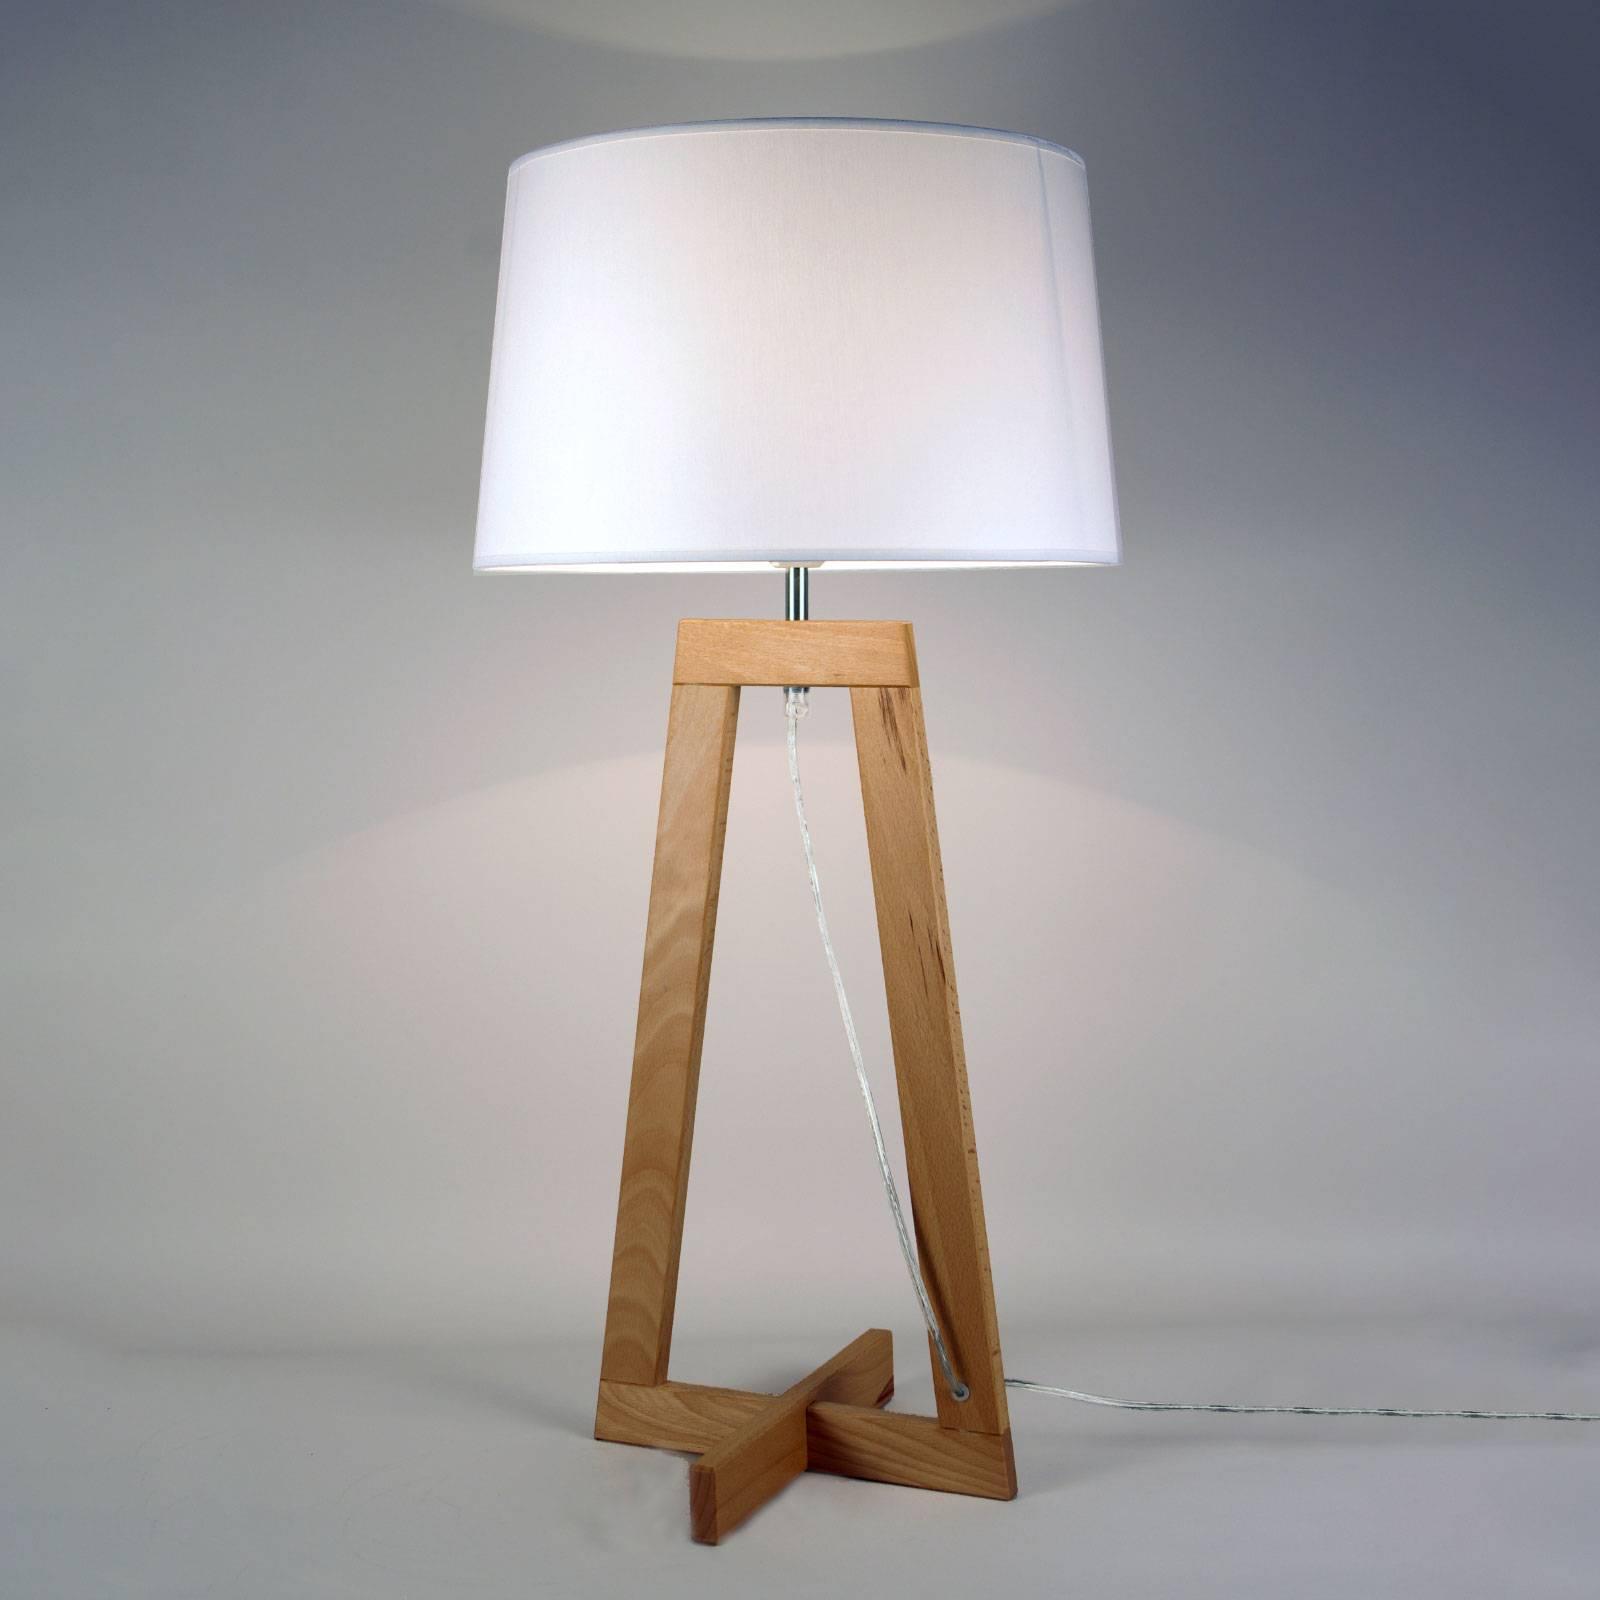 Tafellamp Sacha LT van textiel en hout